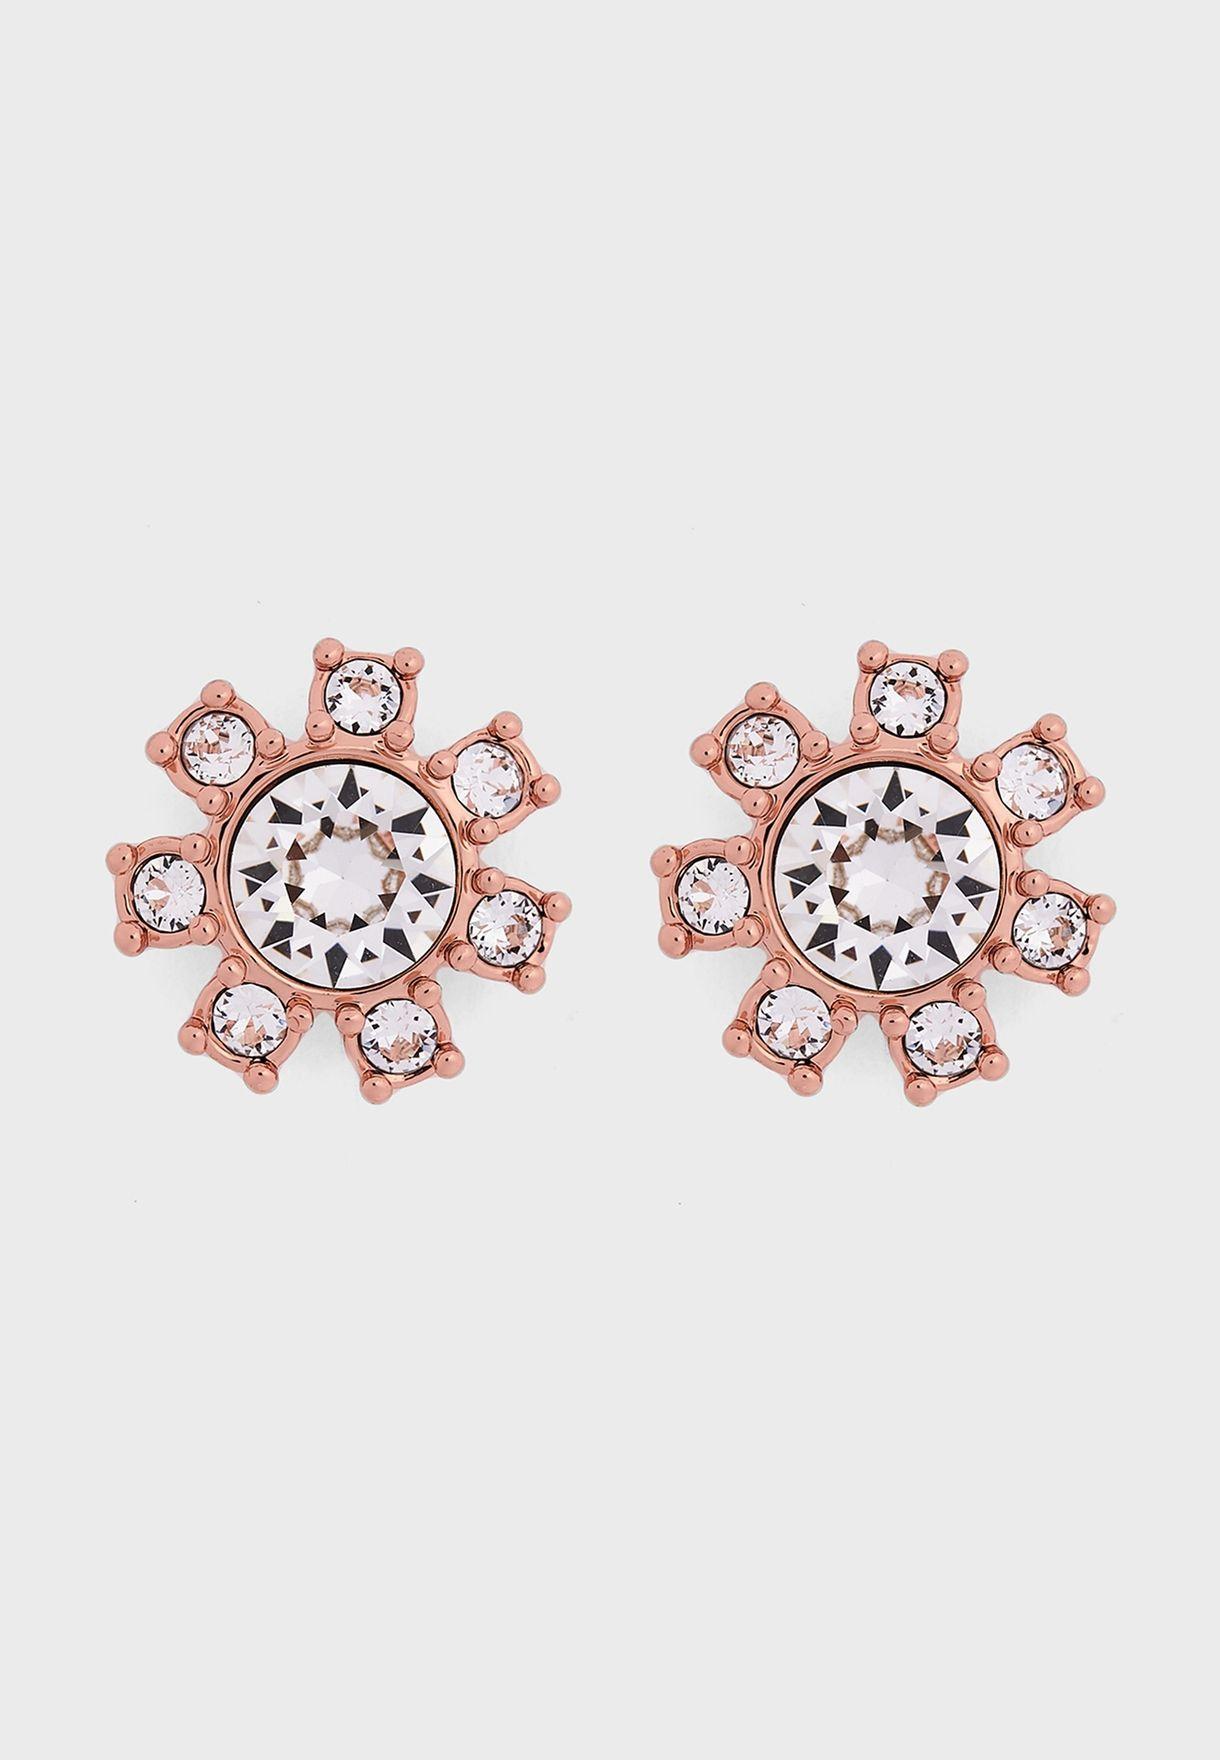 Cesha Daisy Clockwork Stud Earrings